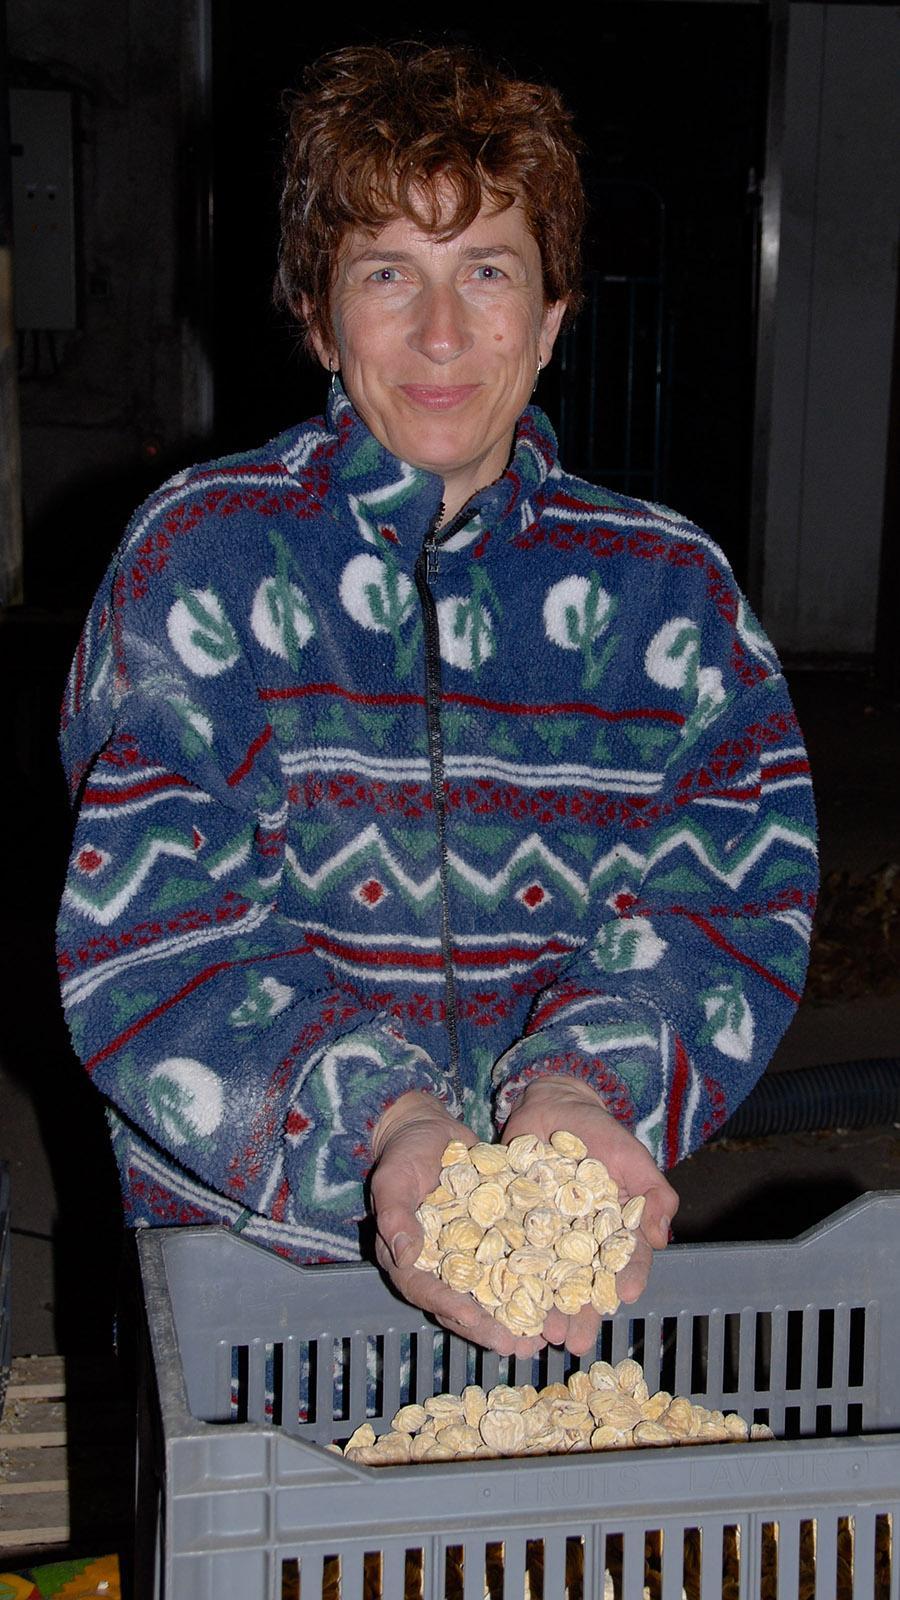 Brotbaum der Berge: Kastanien. In Saint-Martial hält Francine ihre getrockneten châtaignes in der Hand. Foto: Hilke Maunder